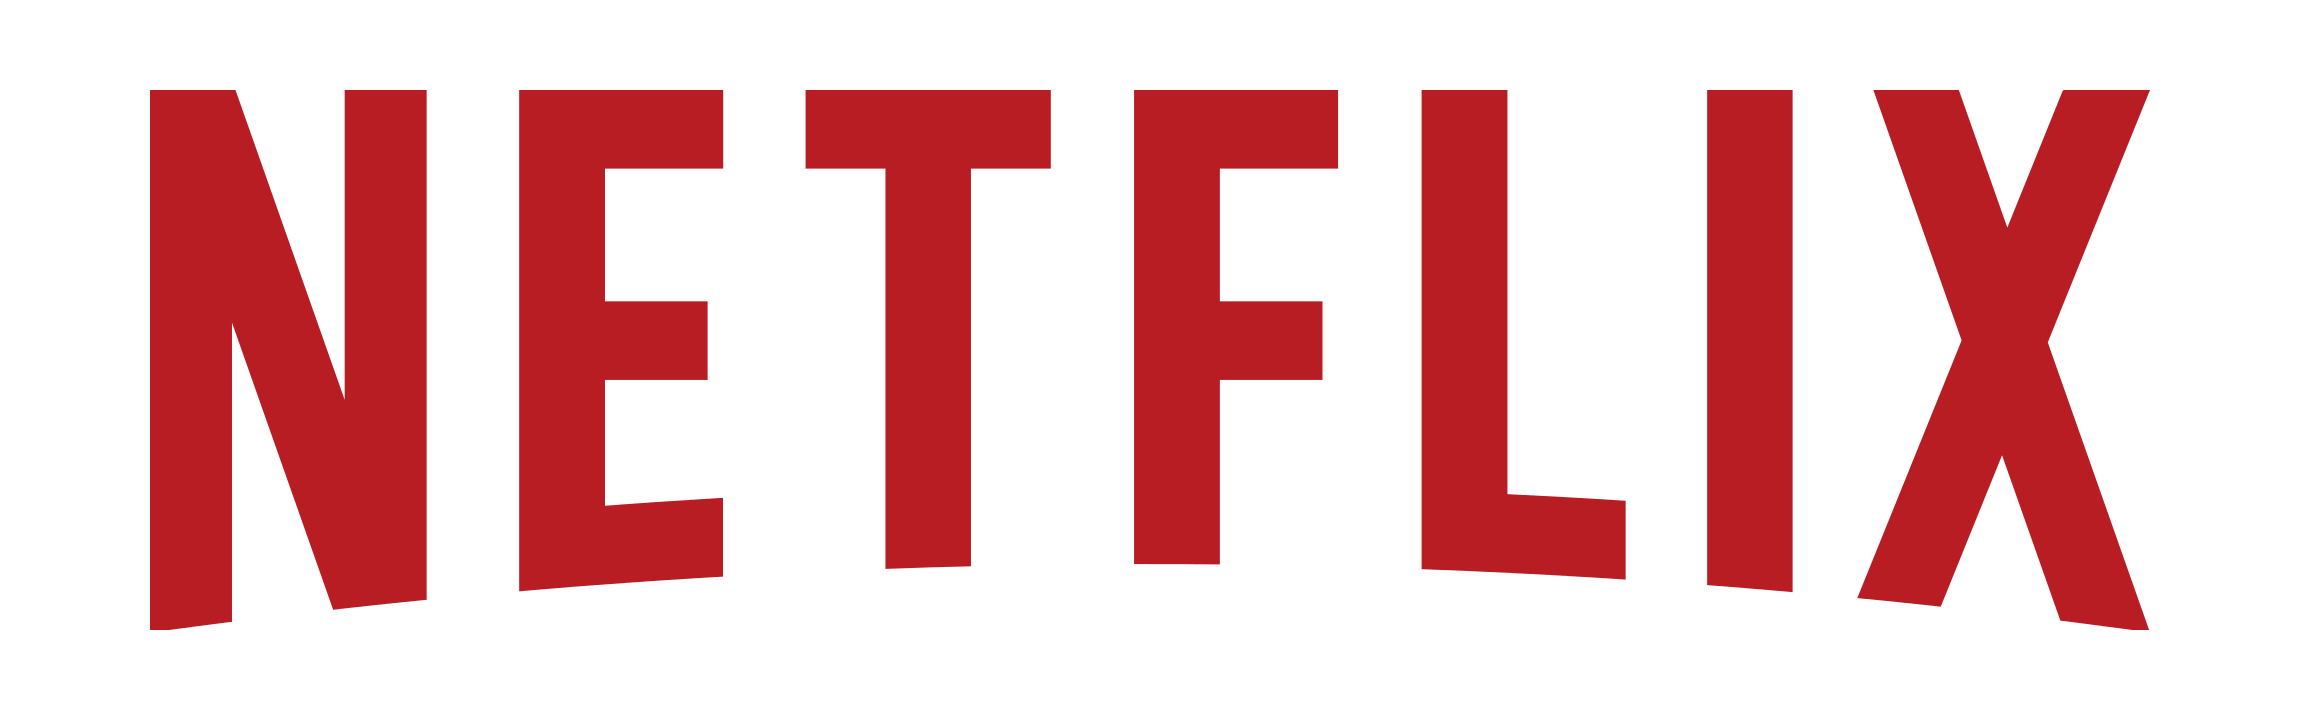 Netflix-Logo - Culturaddict - Netflix Logo Evolution